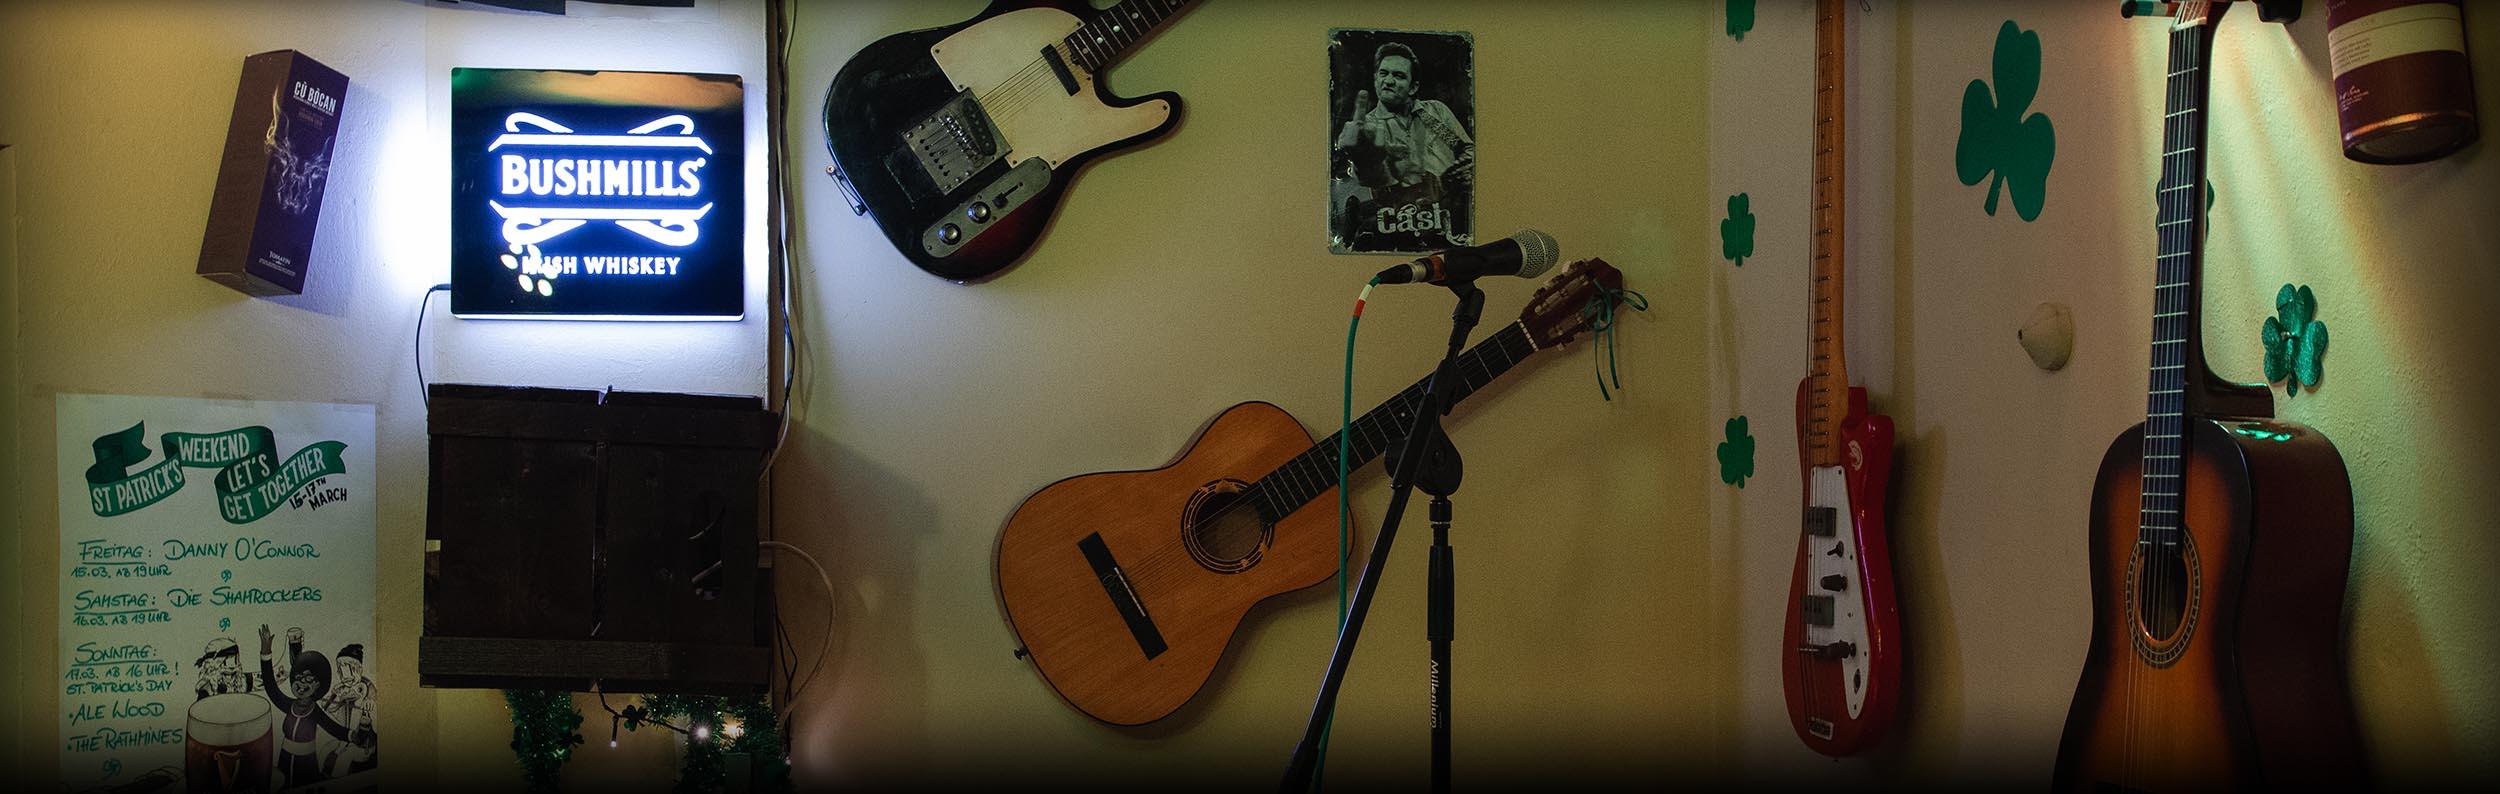 Shamrocks-Irish-Pub-Potsdam-Veranstaltungen-Eventkalender